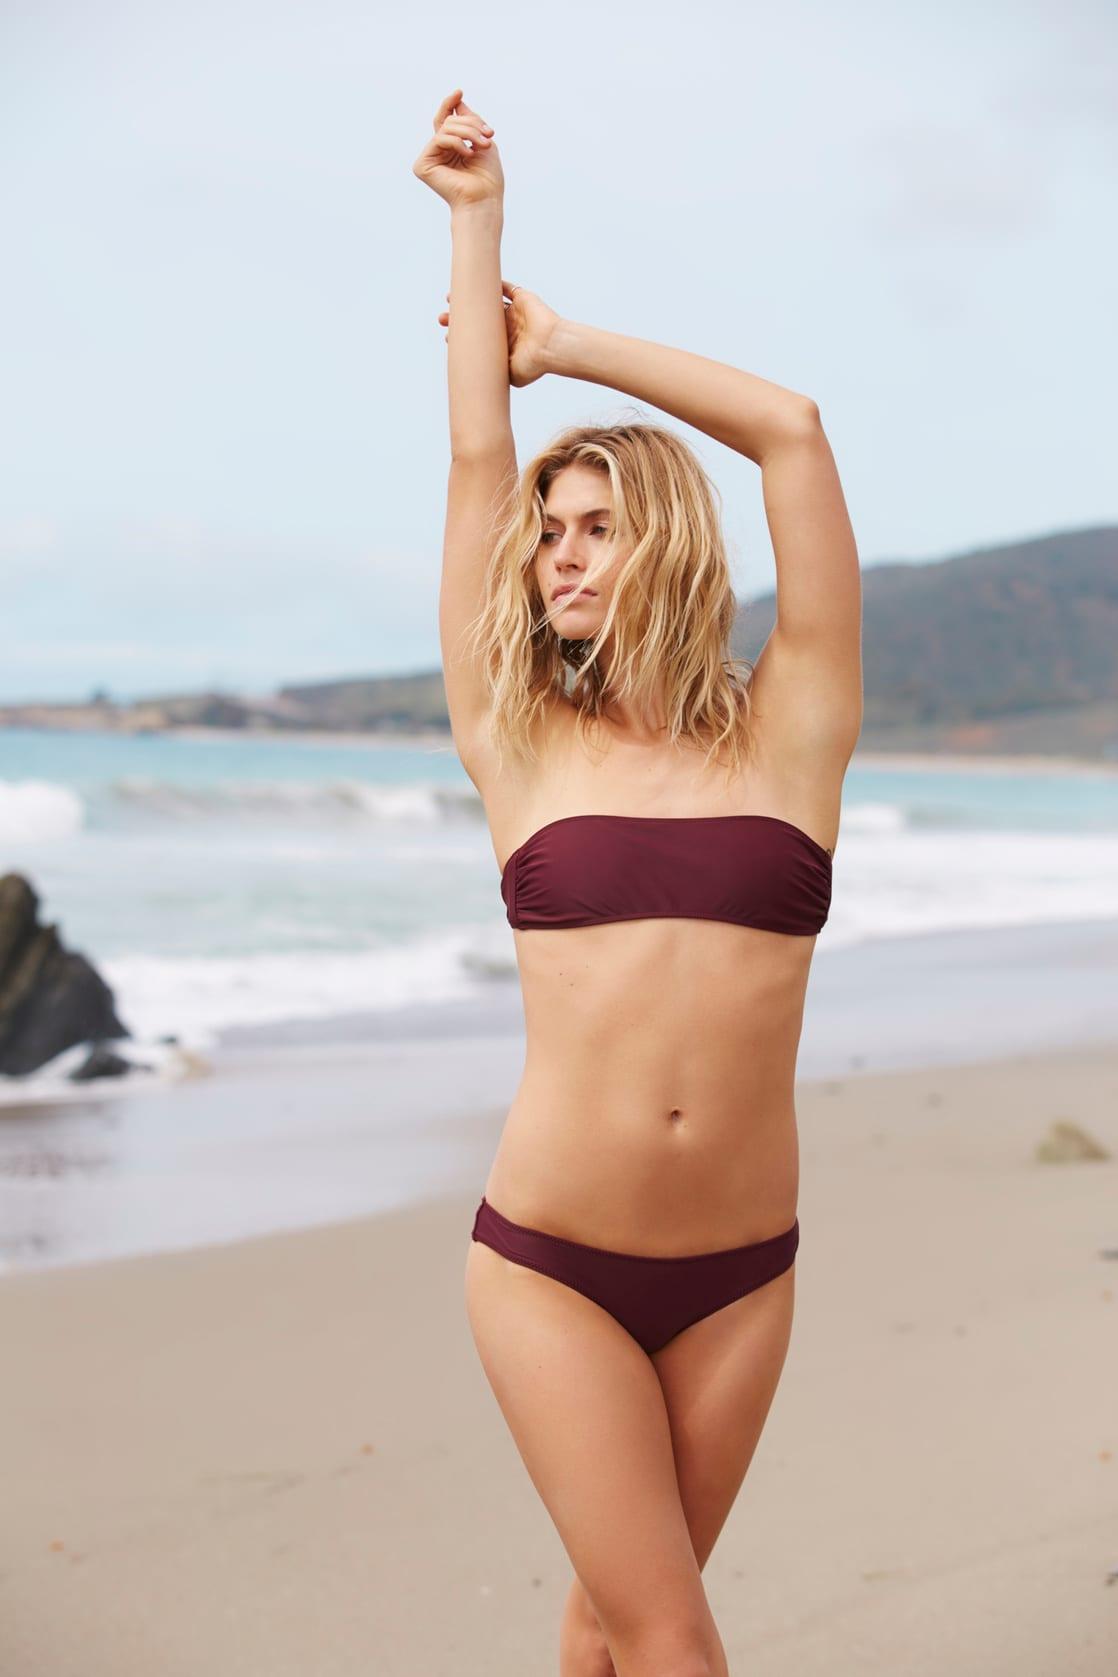 Youtube Laura Ponticorvo nudes (38 photo), Topless, Cleavage, Feet, butt 2017